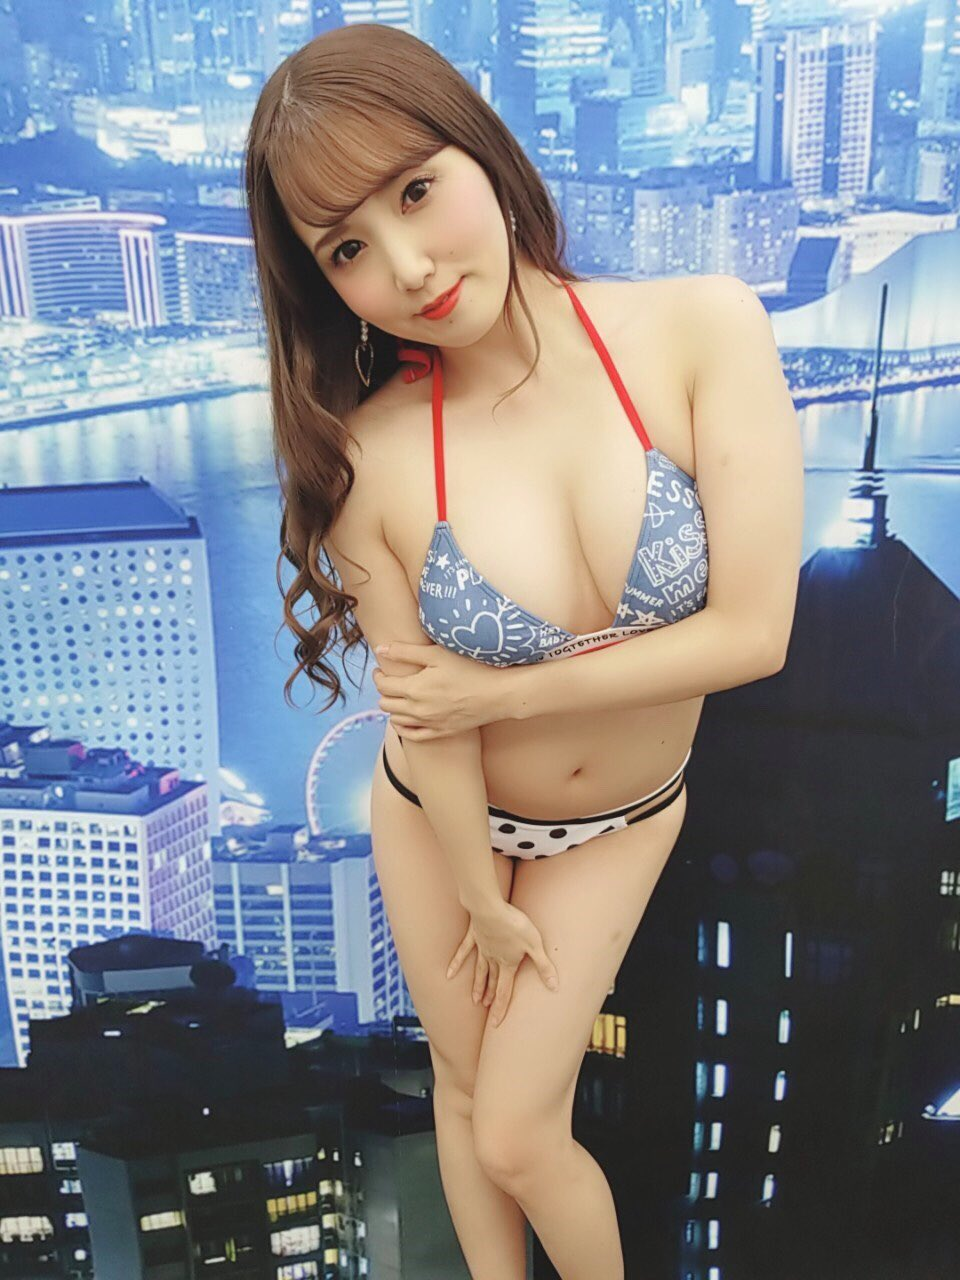 tomodaayaka 1185893057578717184_p2